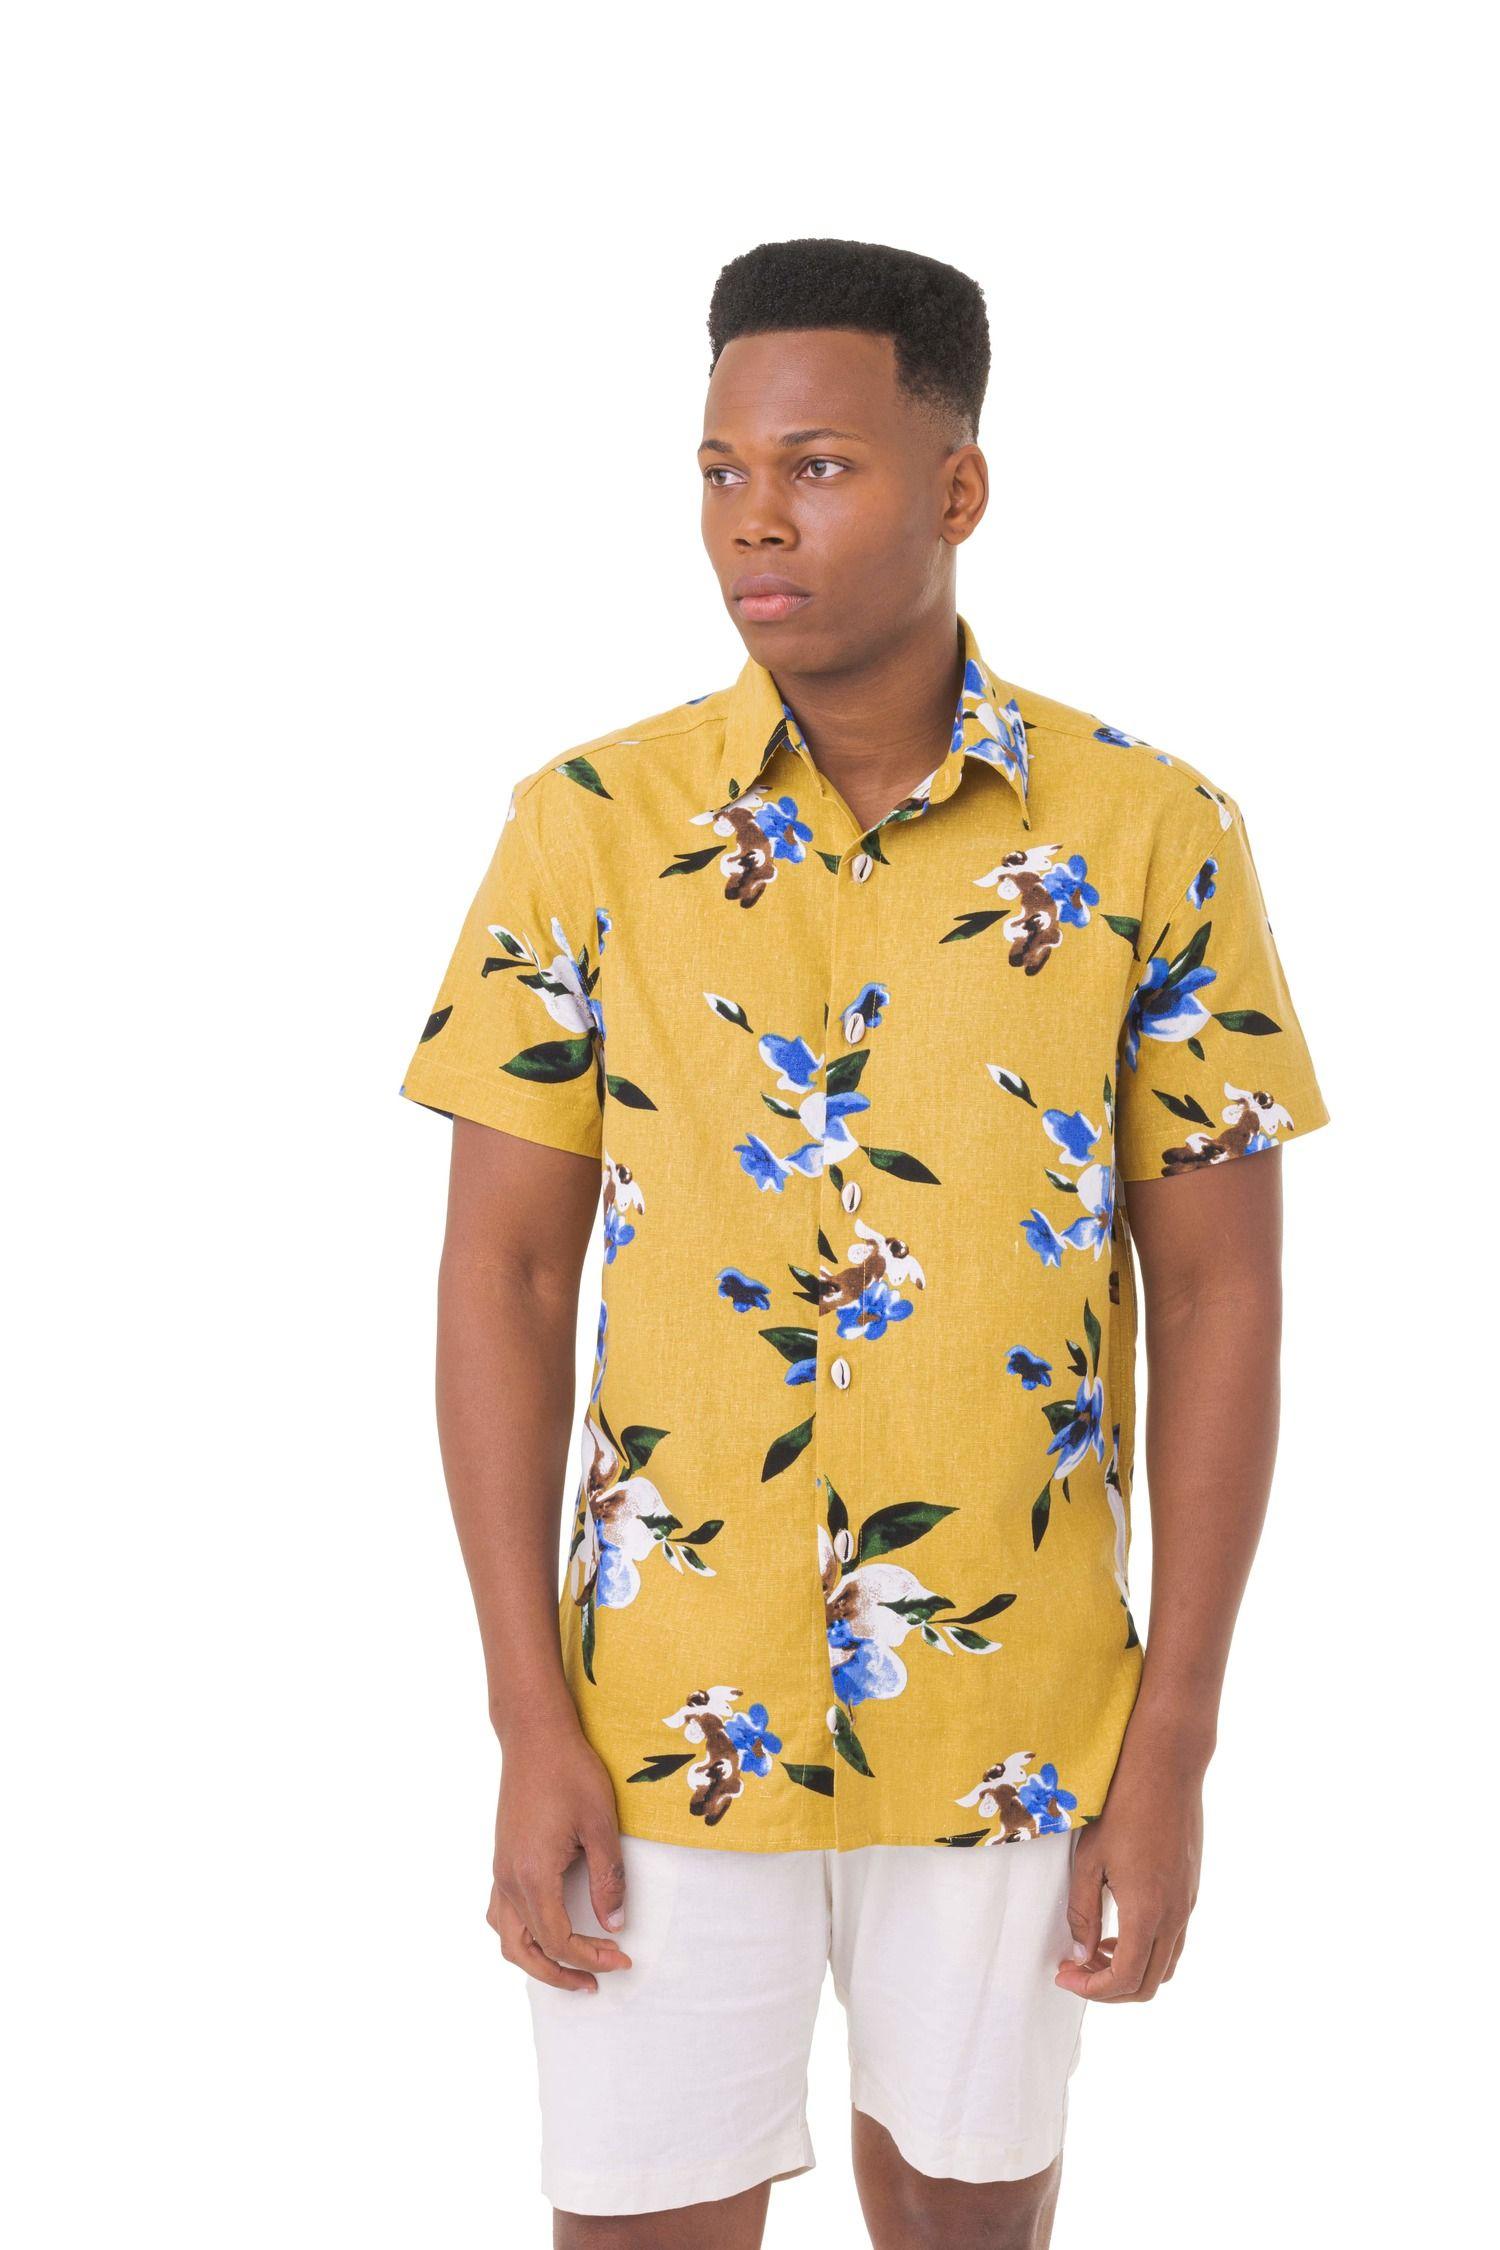 Camisa AfroBúzios